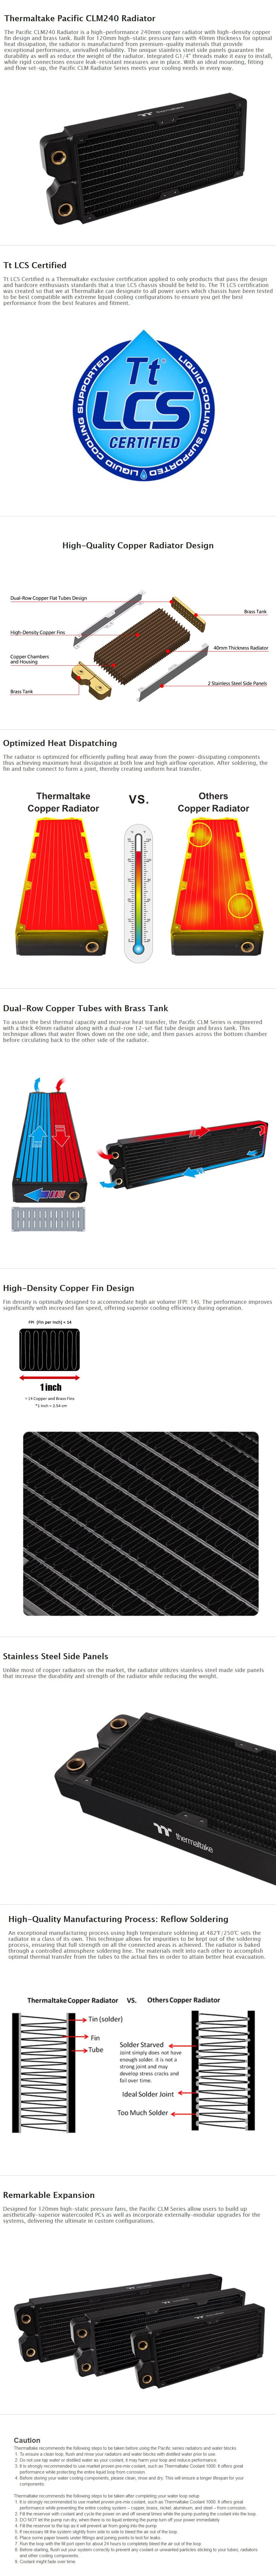 Thermaltake Pacific CLM240 240mm Radiator - Desktop Overview 1